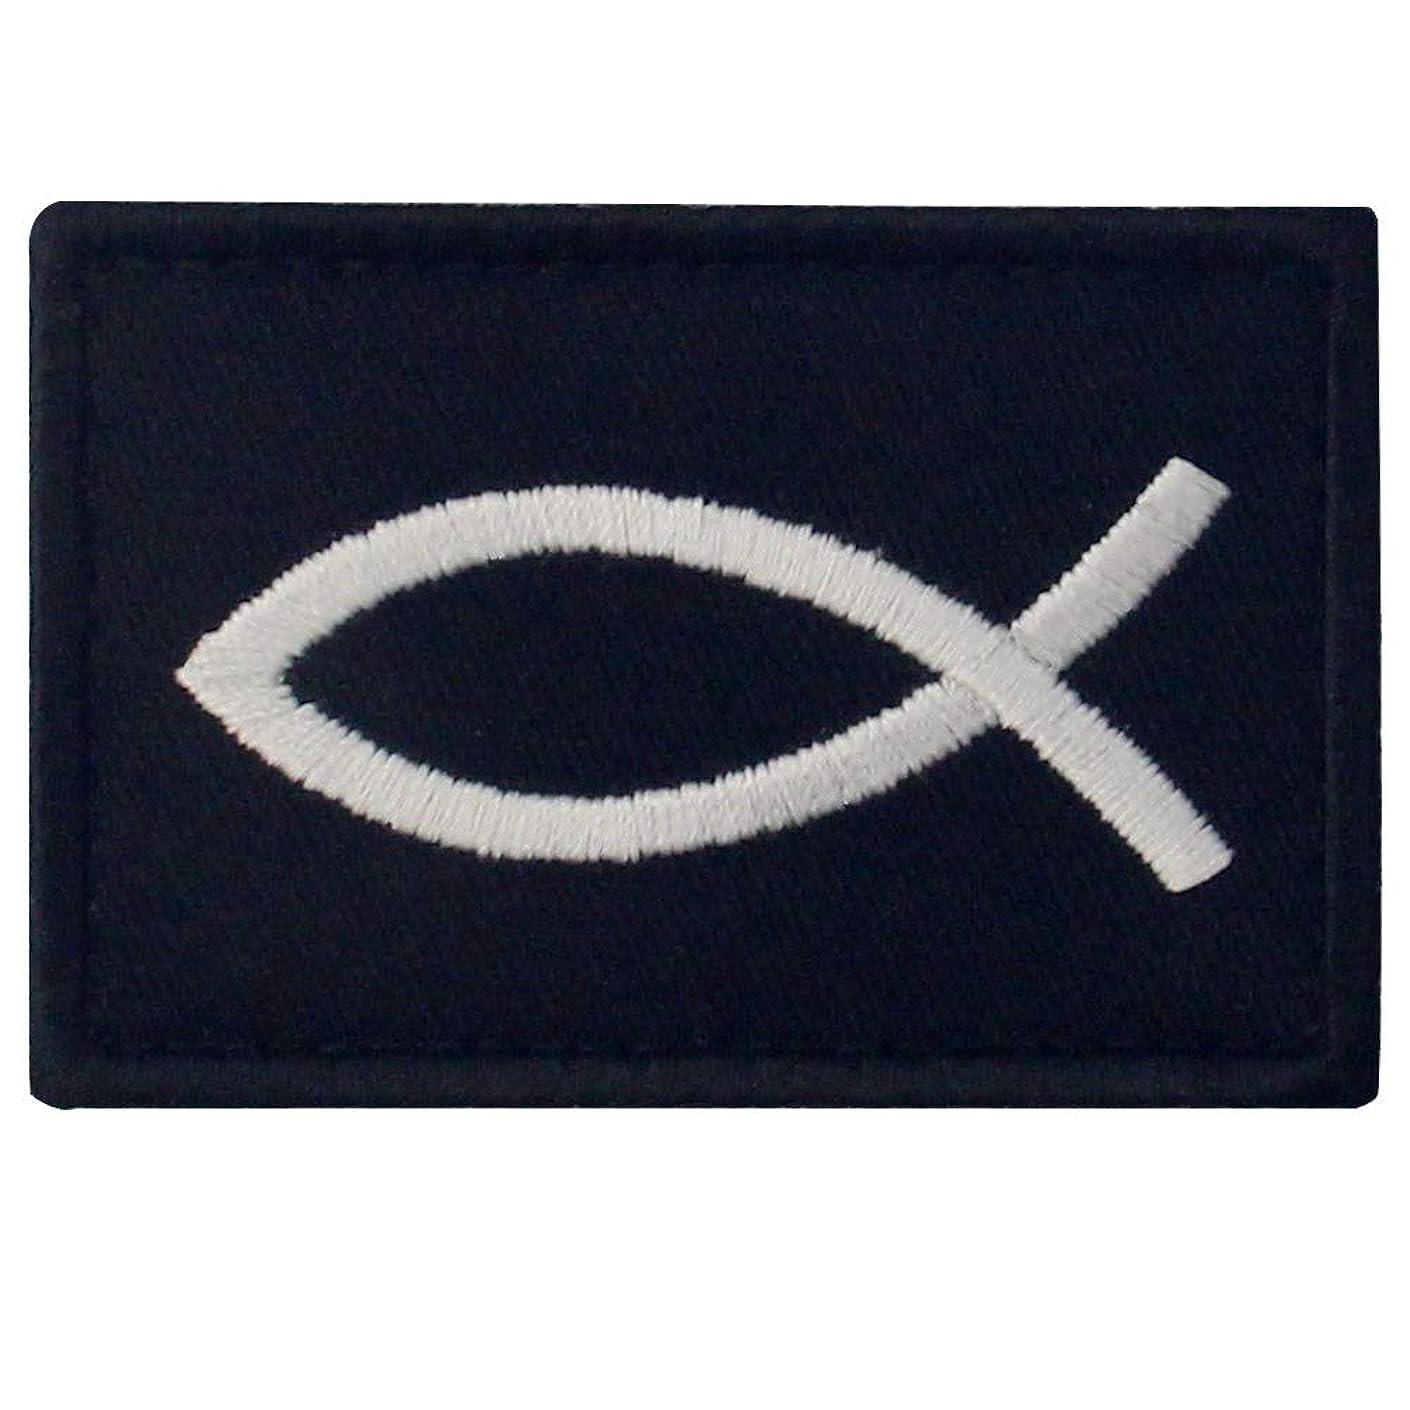 Jesus Fish Ichthys Patch Embroidered Morale Applique Fastener Hook & Loop Emblem - White & Black